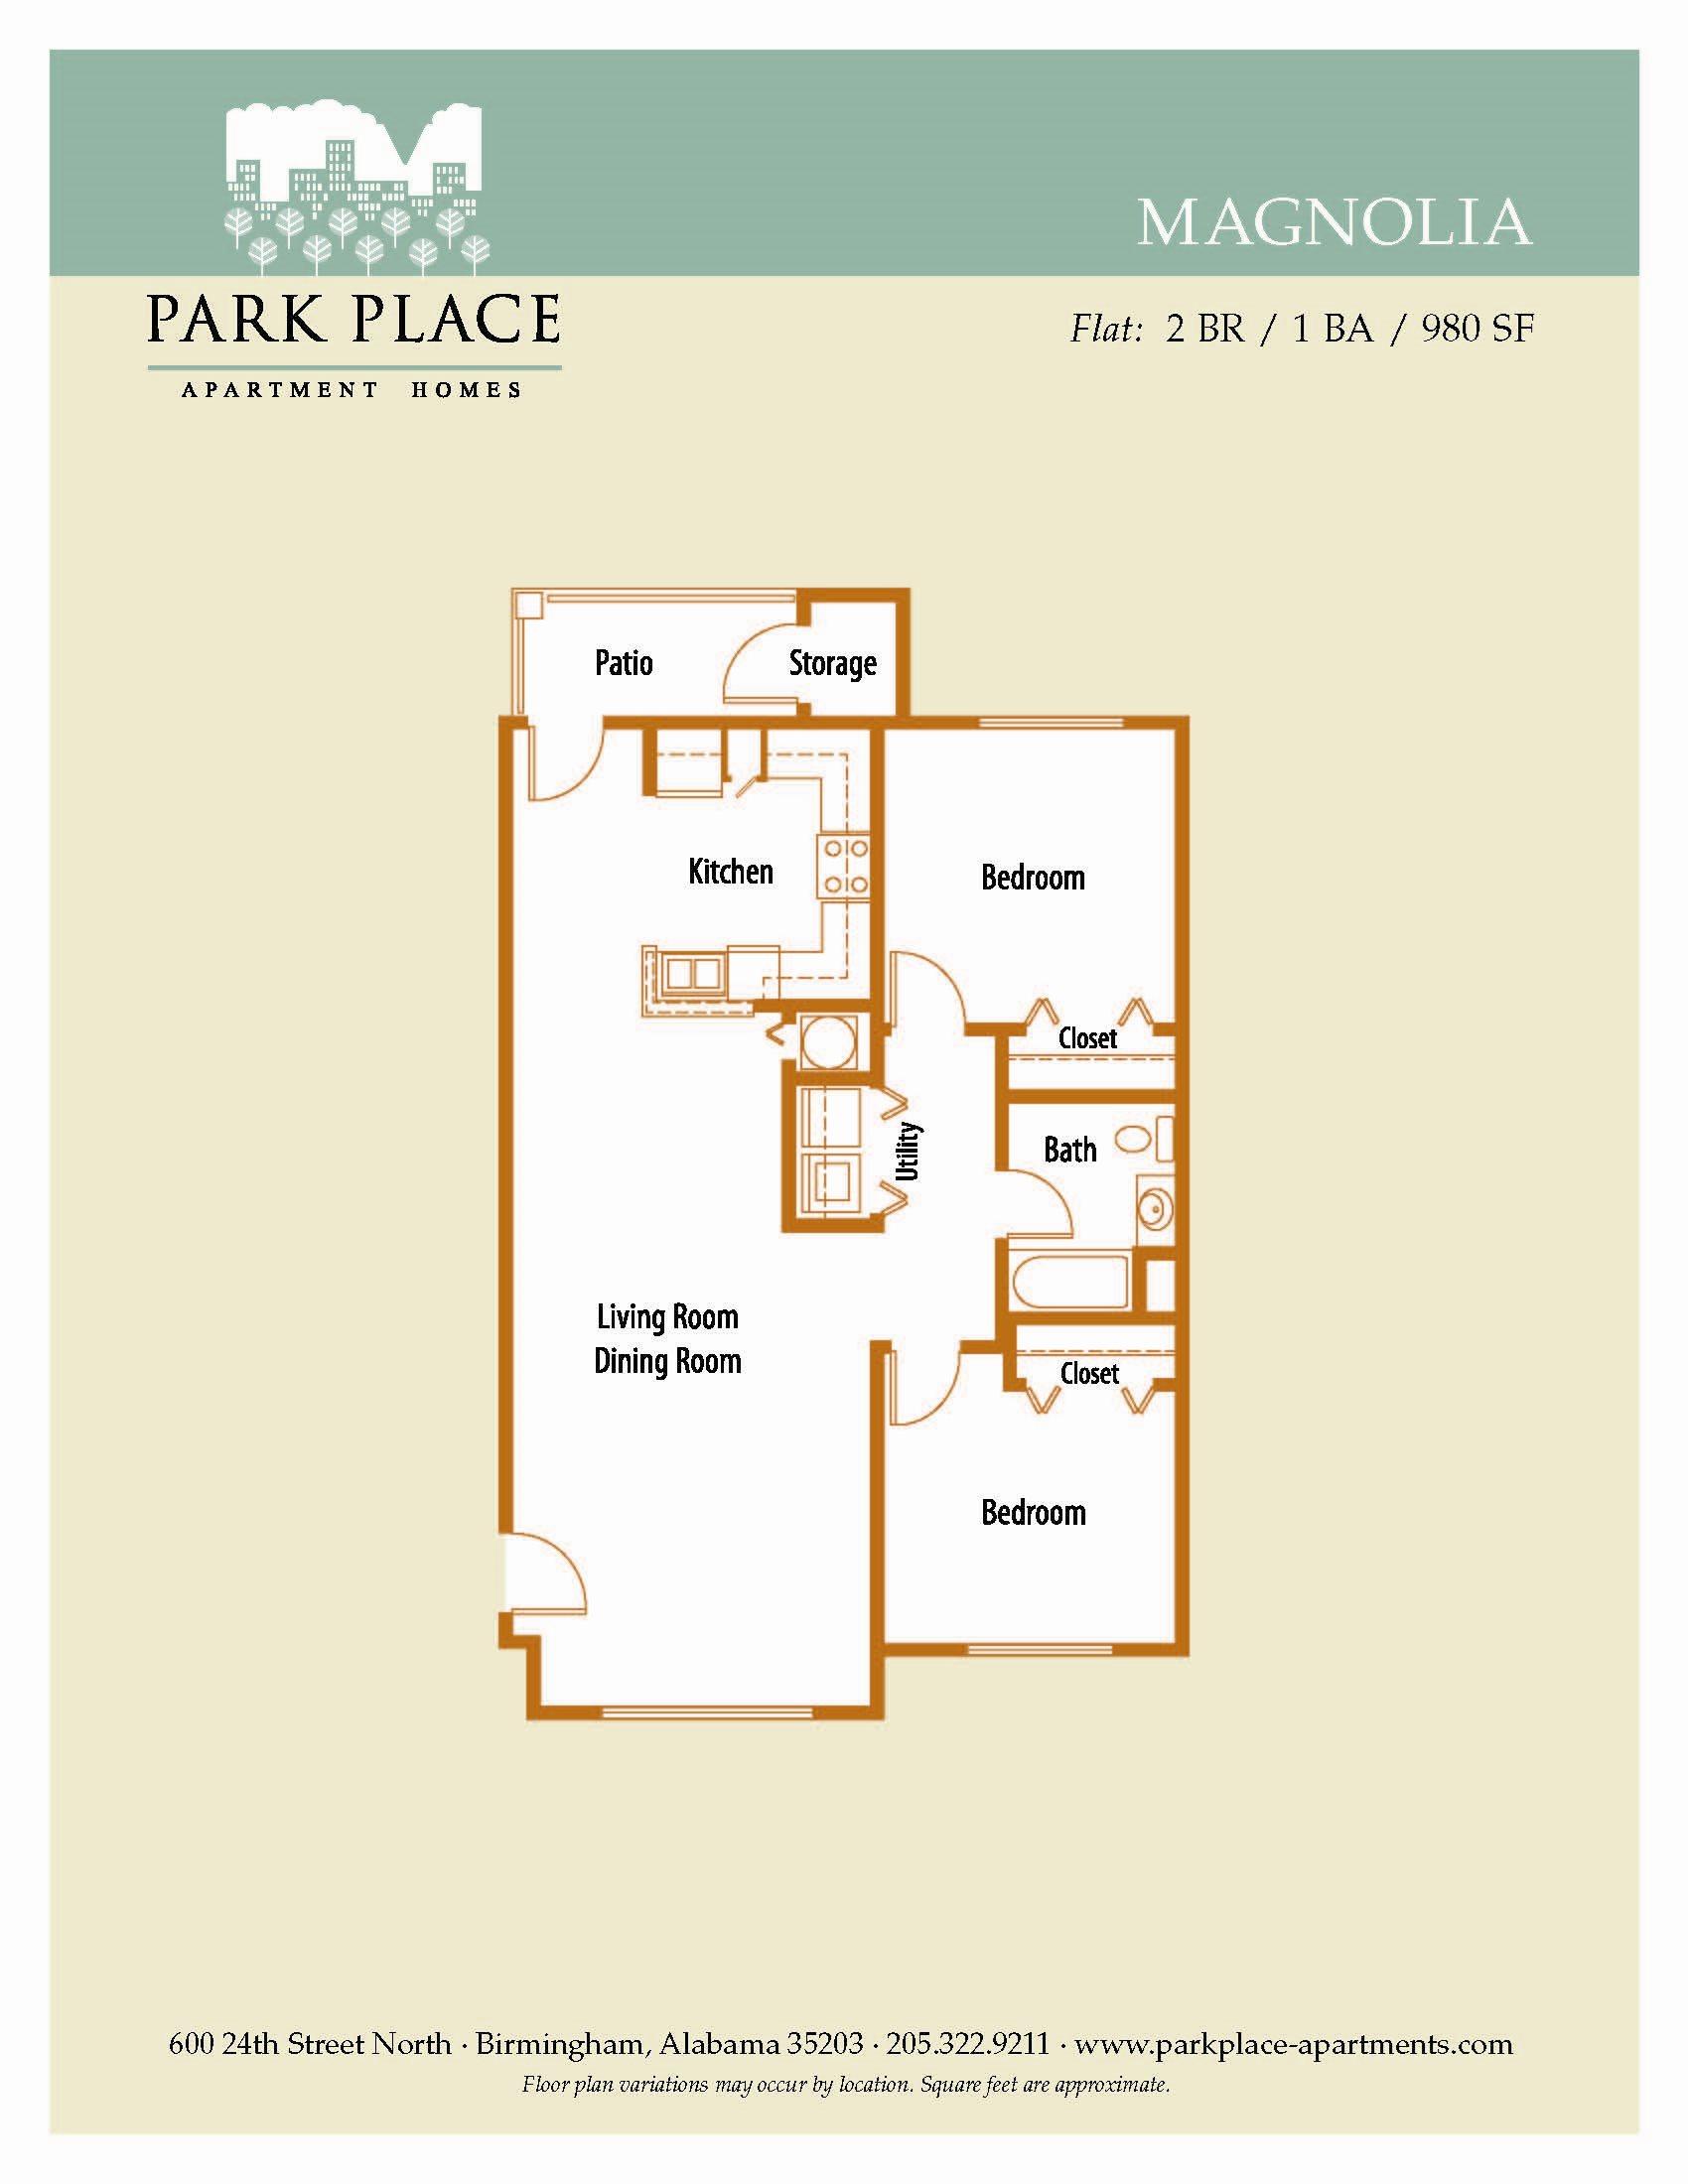 Magnolia Floor Plan 4